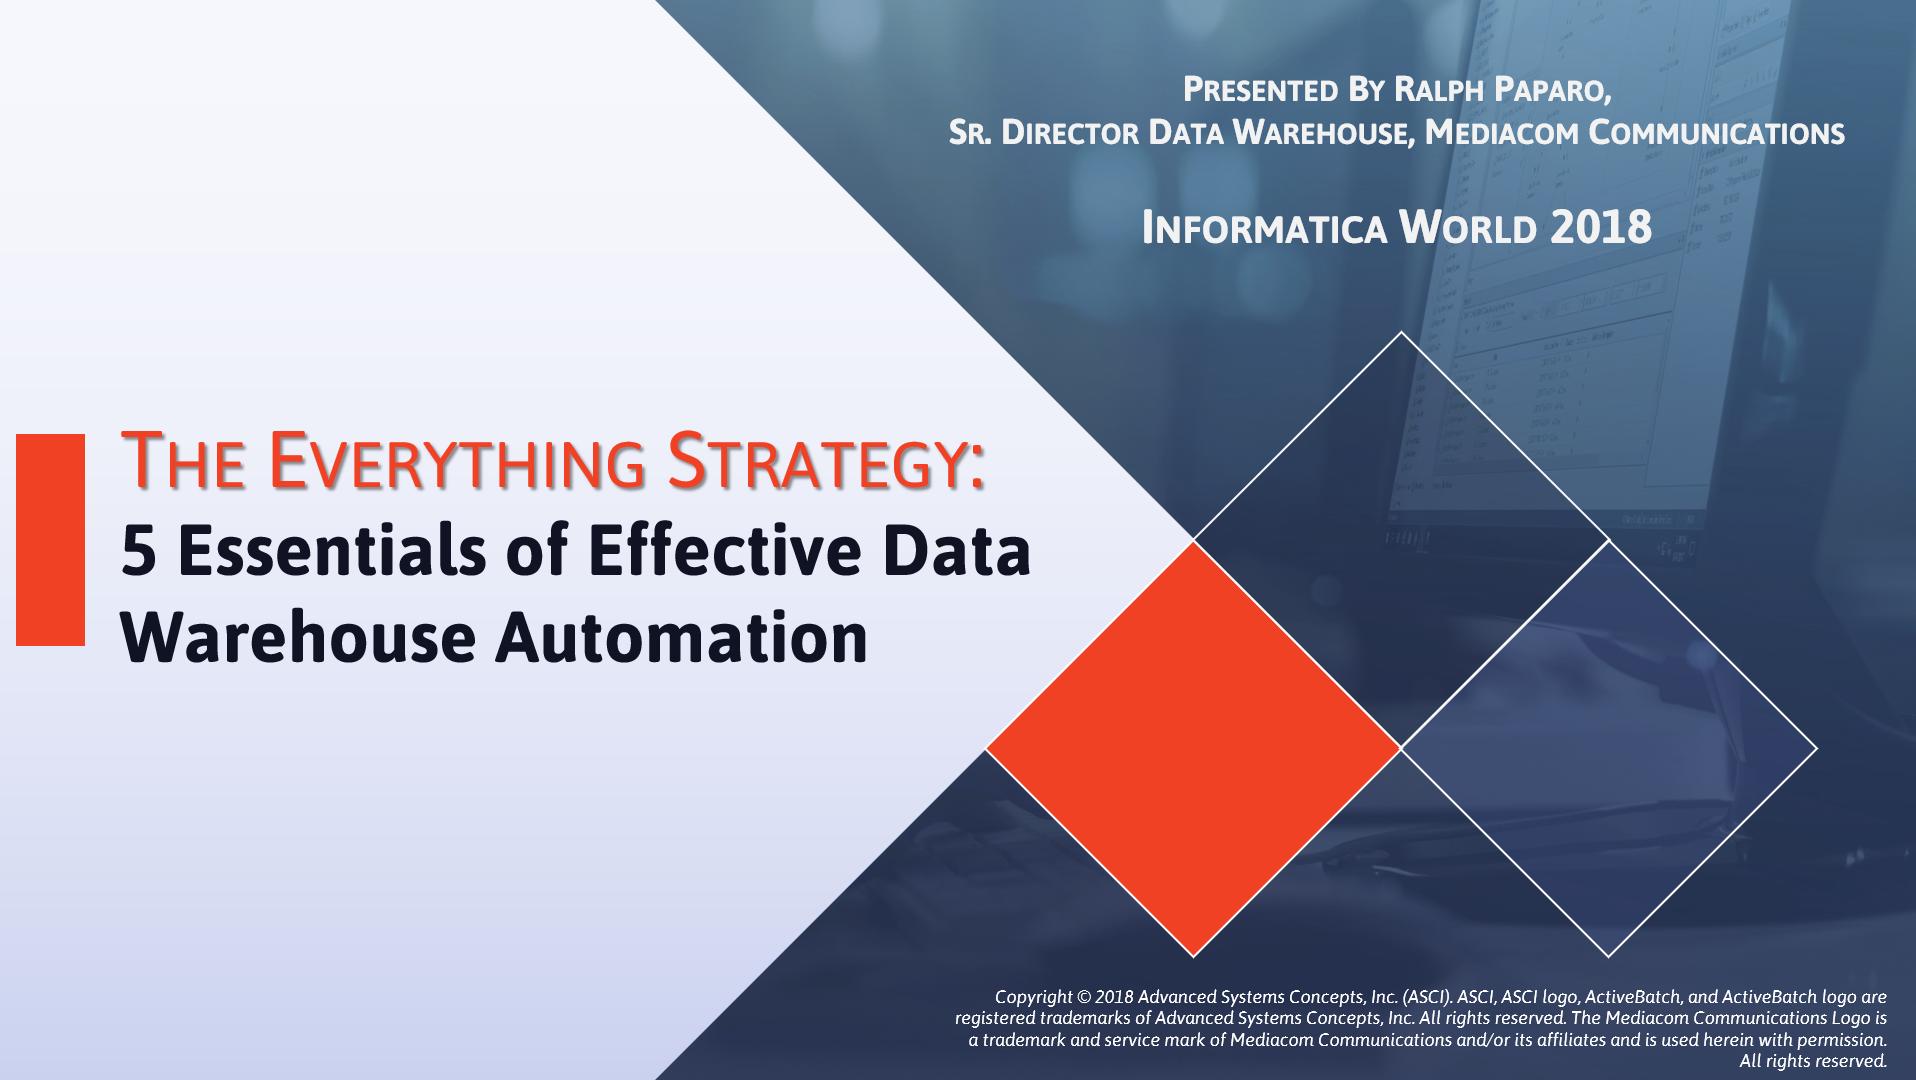 Data-Warehouse-IT-Automation-Mediacom